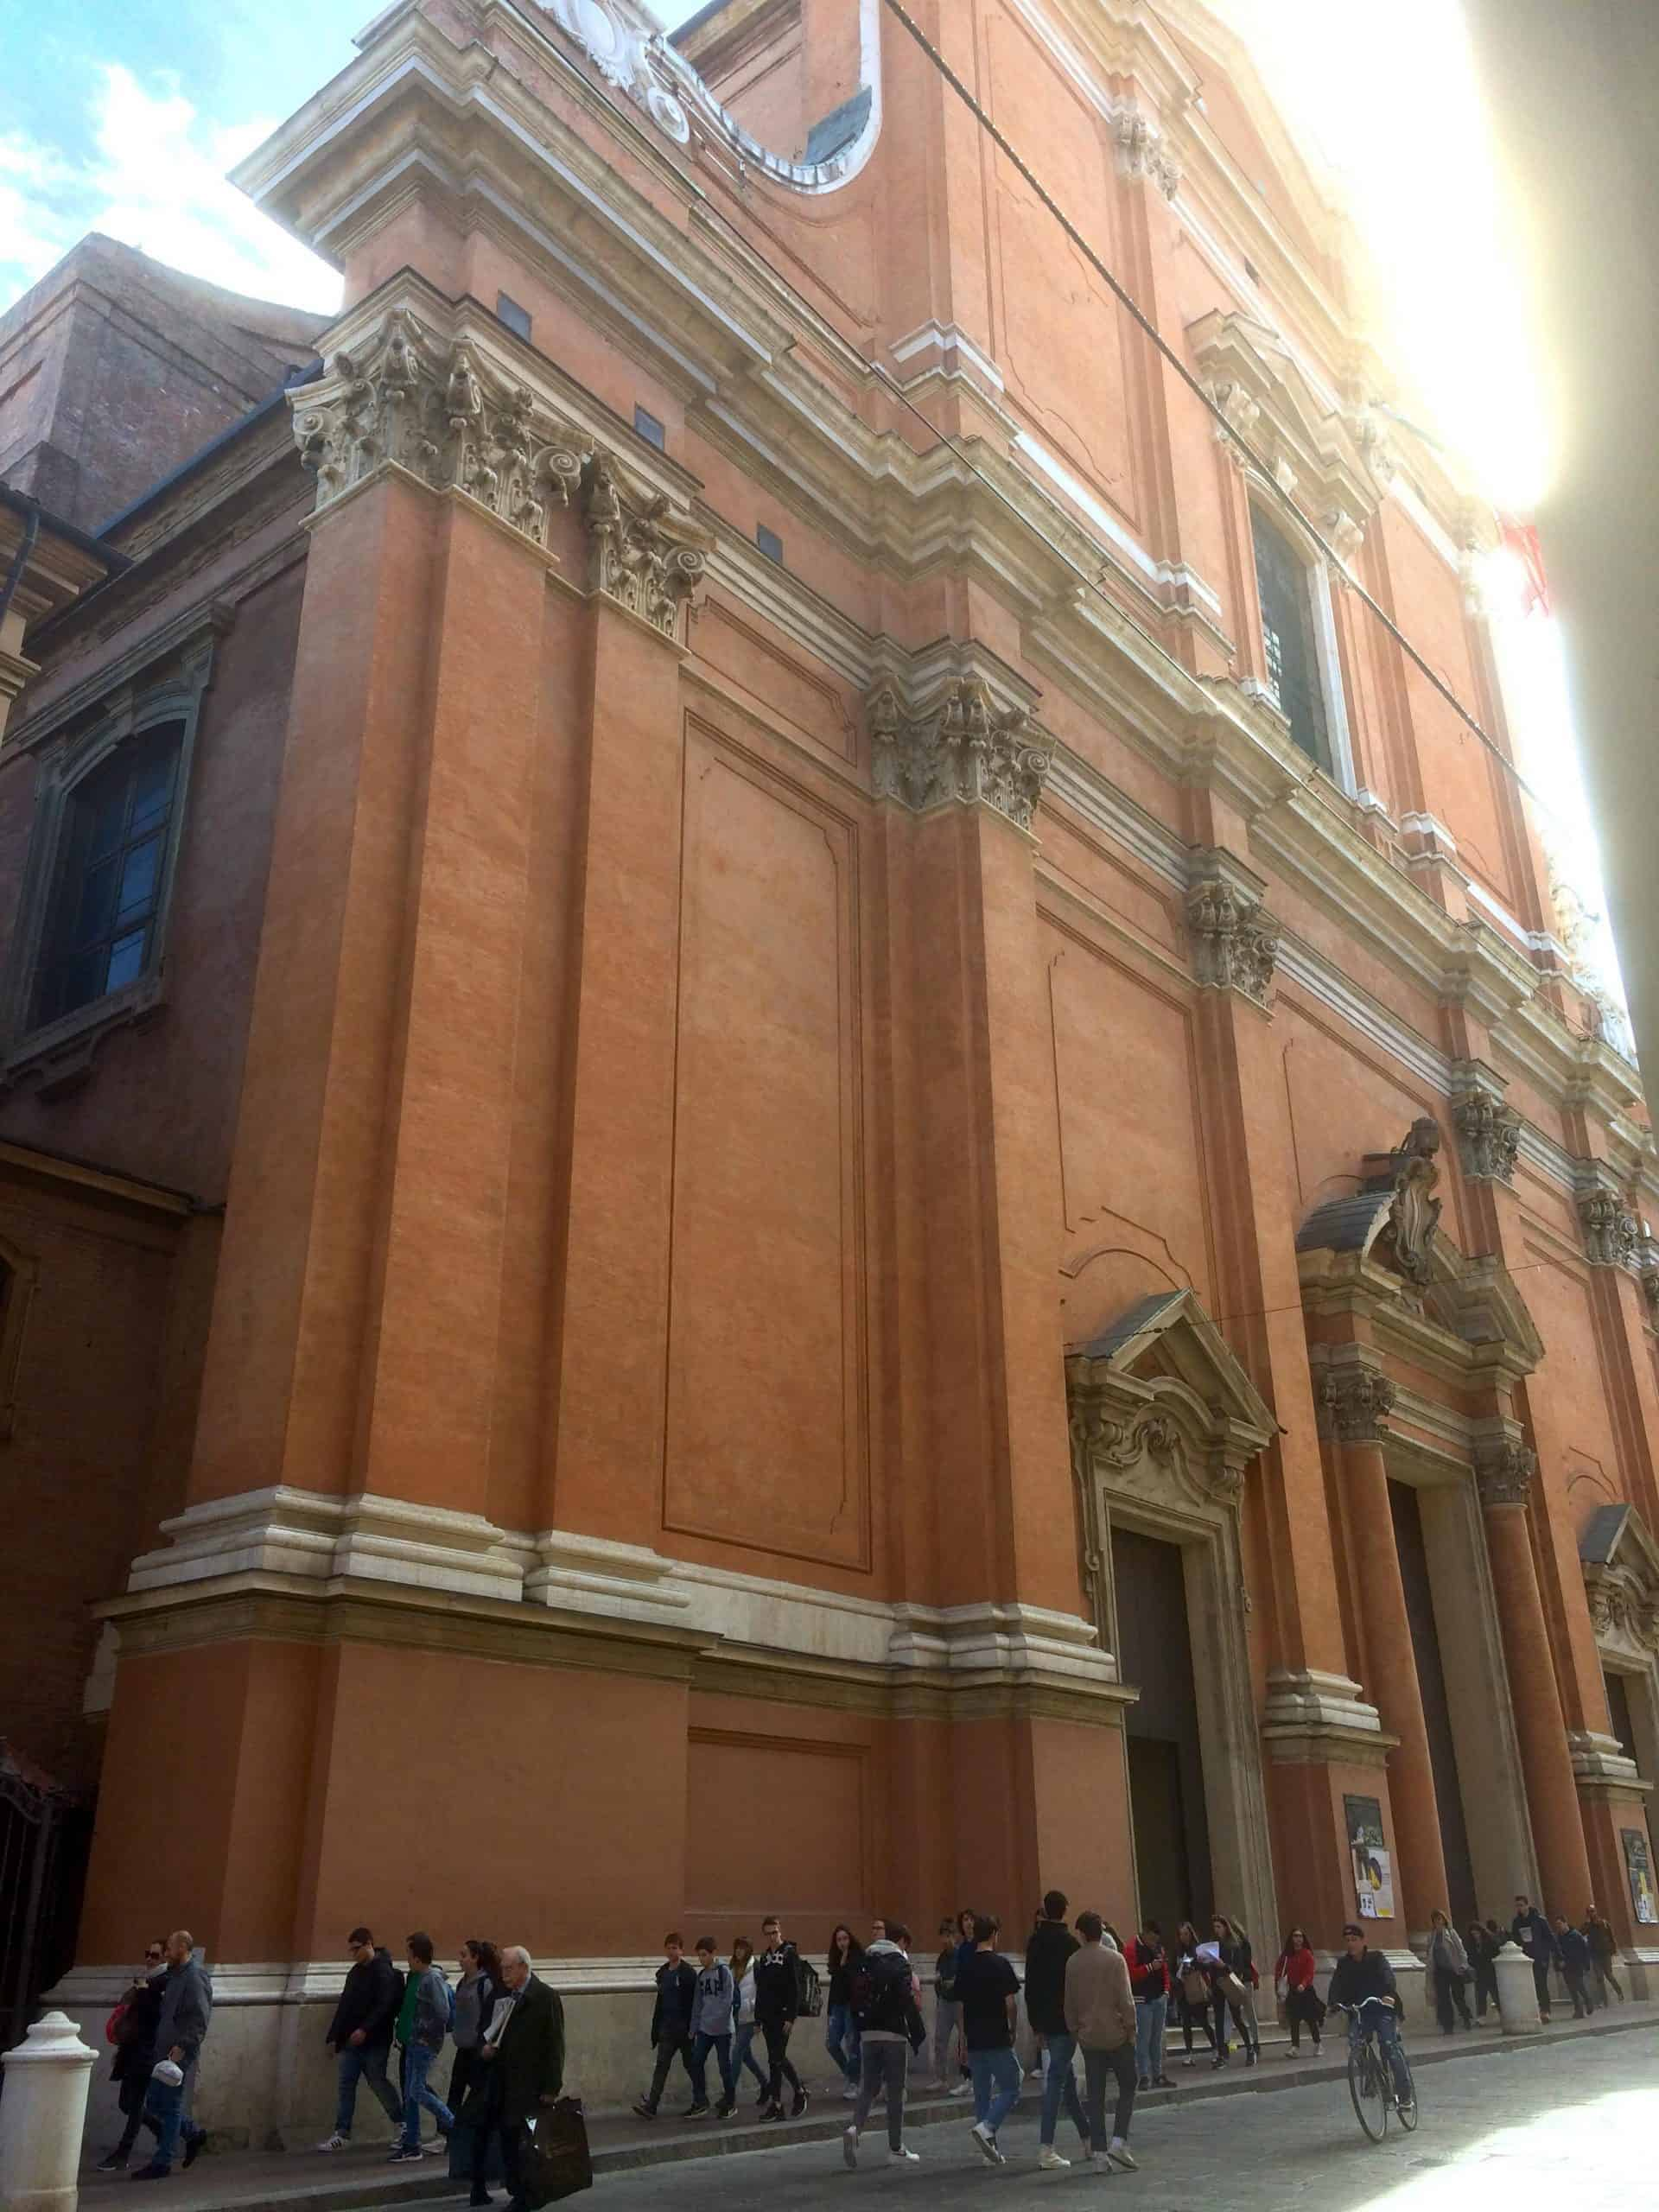 bologna_essential11) Metropolitan Cathedral (OKenzie)